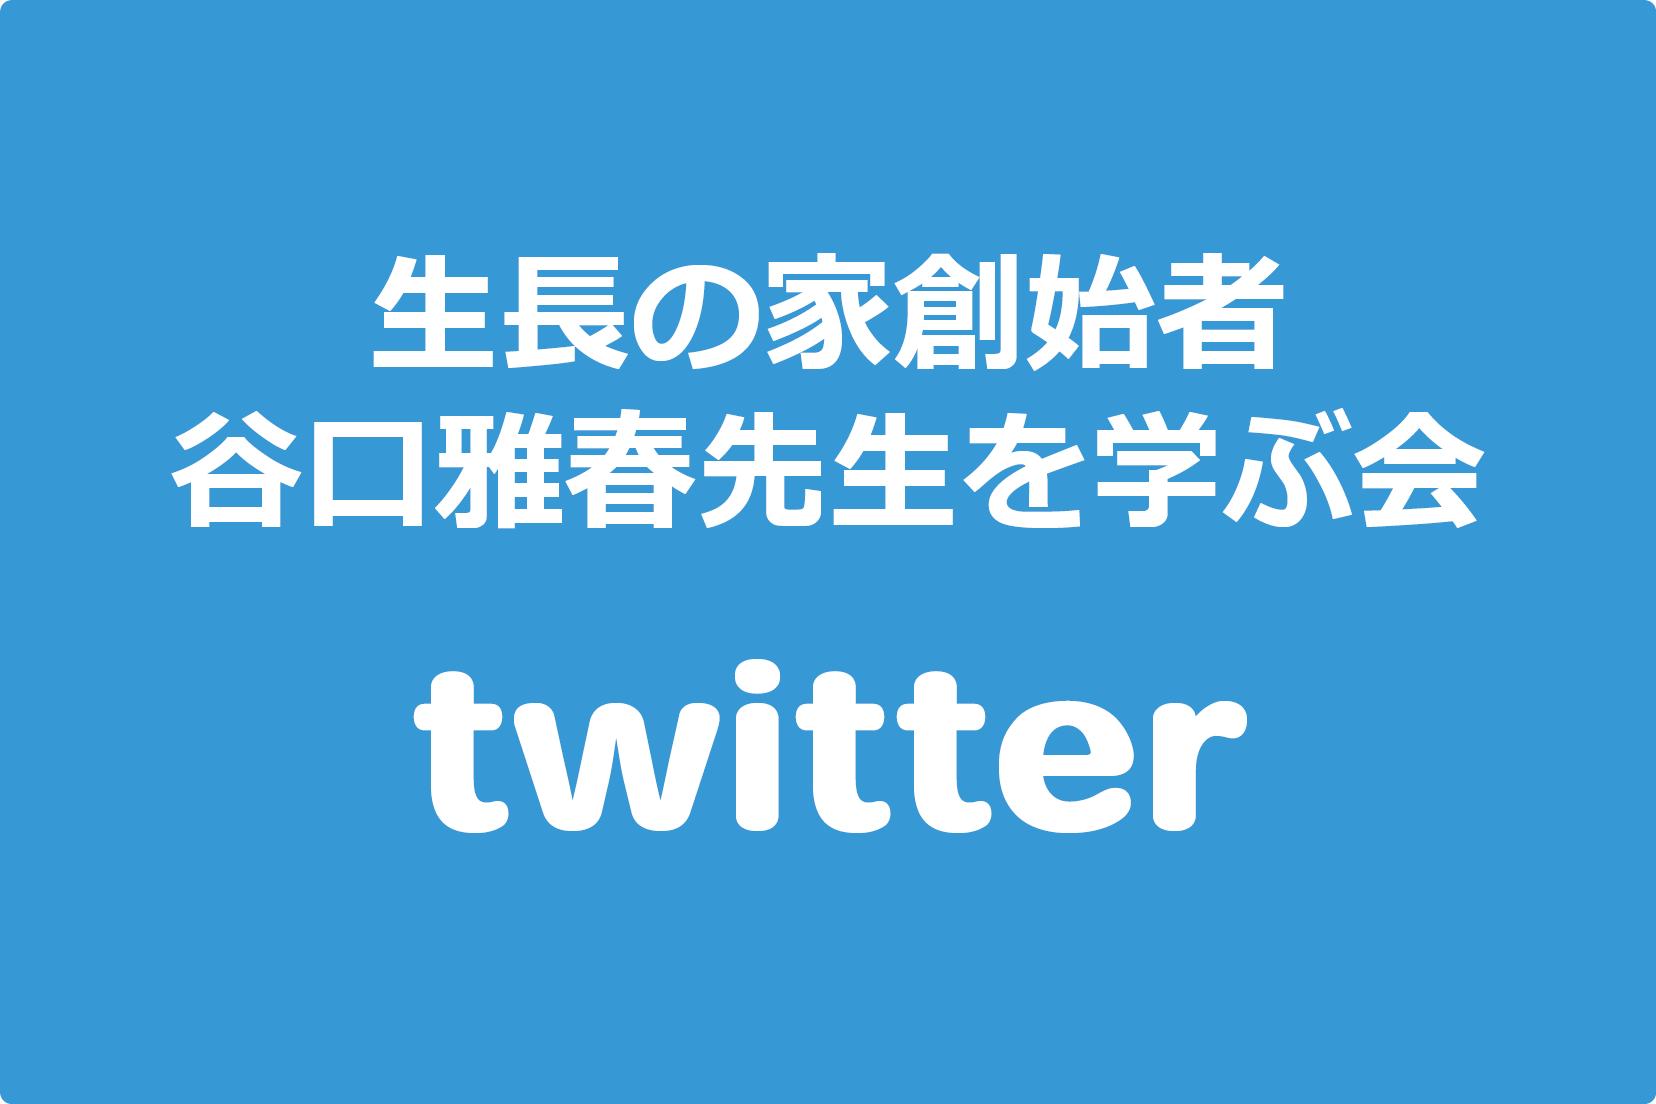 Twitterアカウントを開設しました。